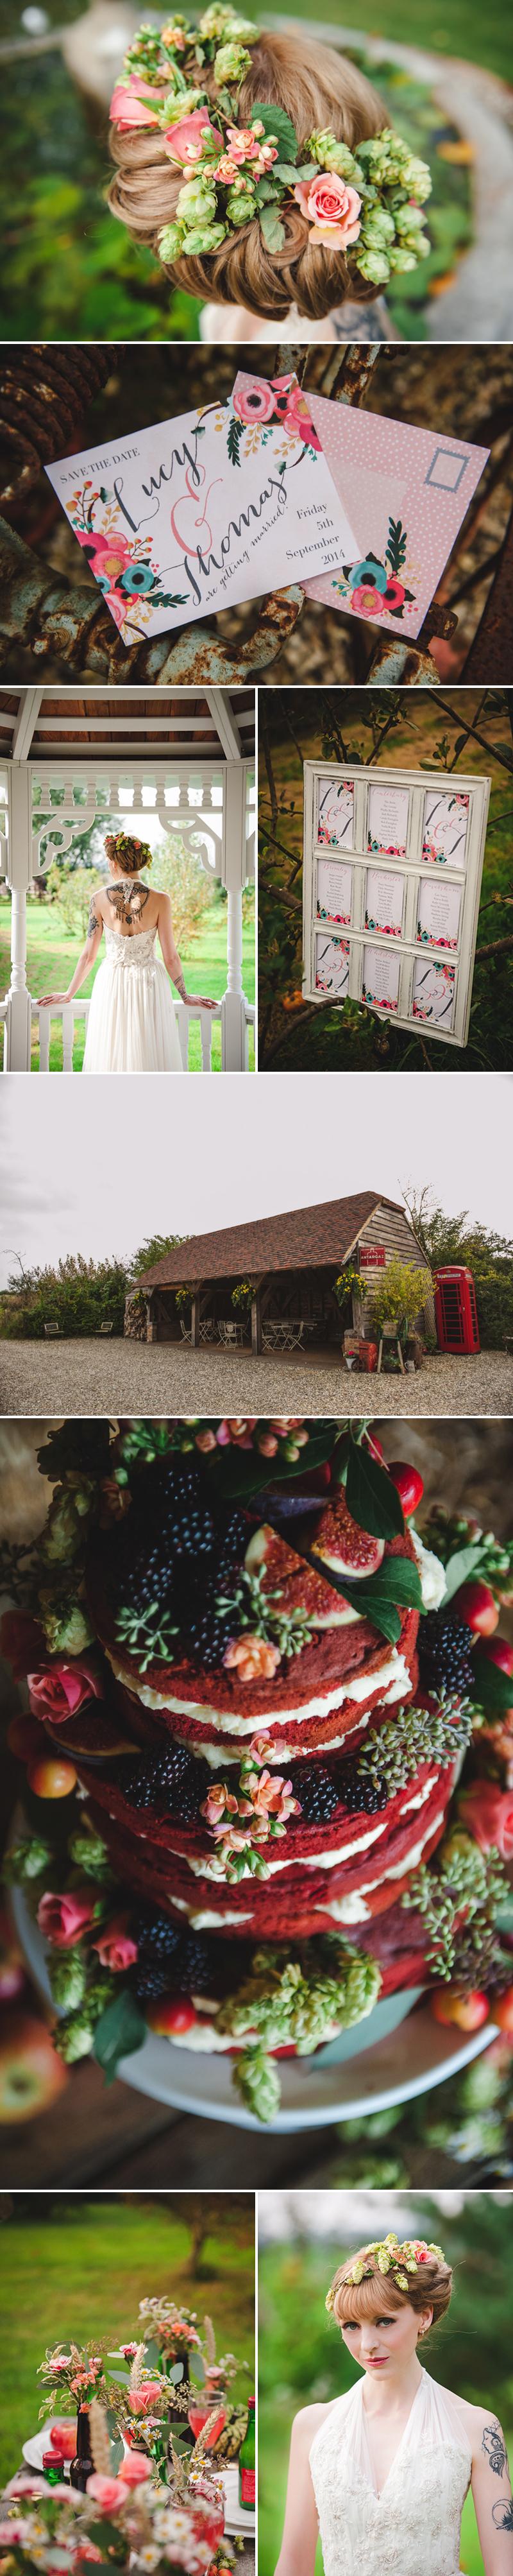 kent-wedding-venue-wedding-inspiration-the-maid-of-kent-heline-bekker-photography-coco-wedding-venues-003